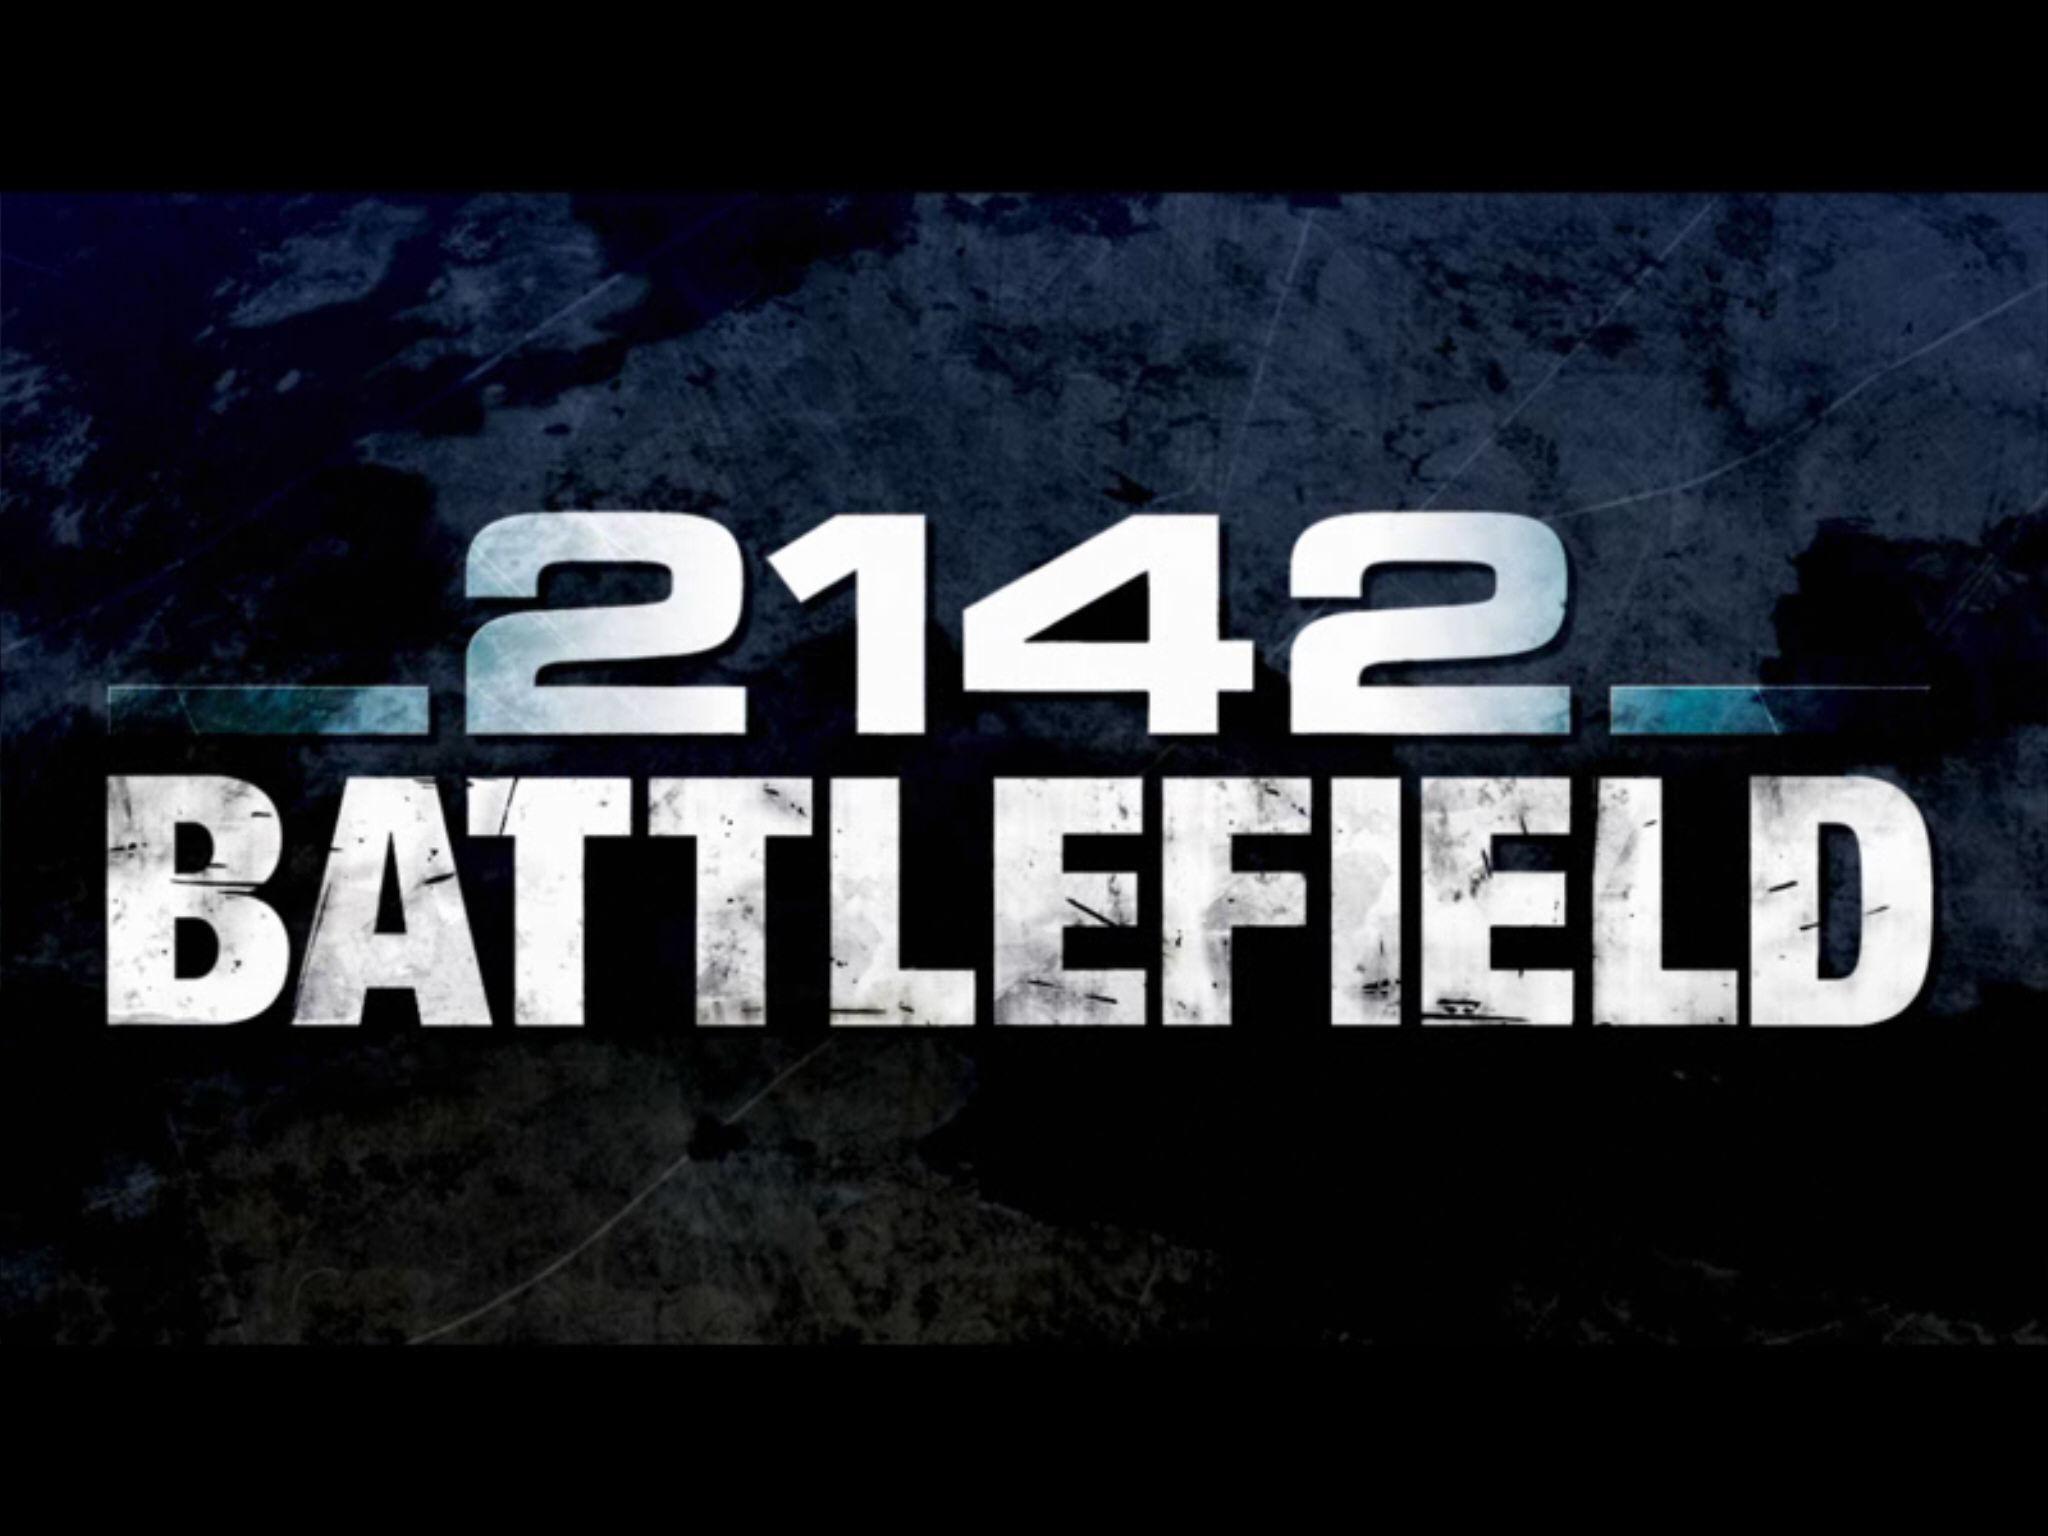 [Mi Subida] Battlefield 2142 [Español] [MEGA] [1Link]